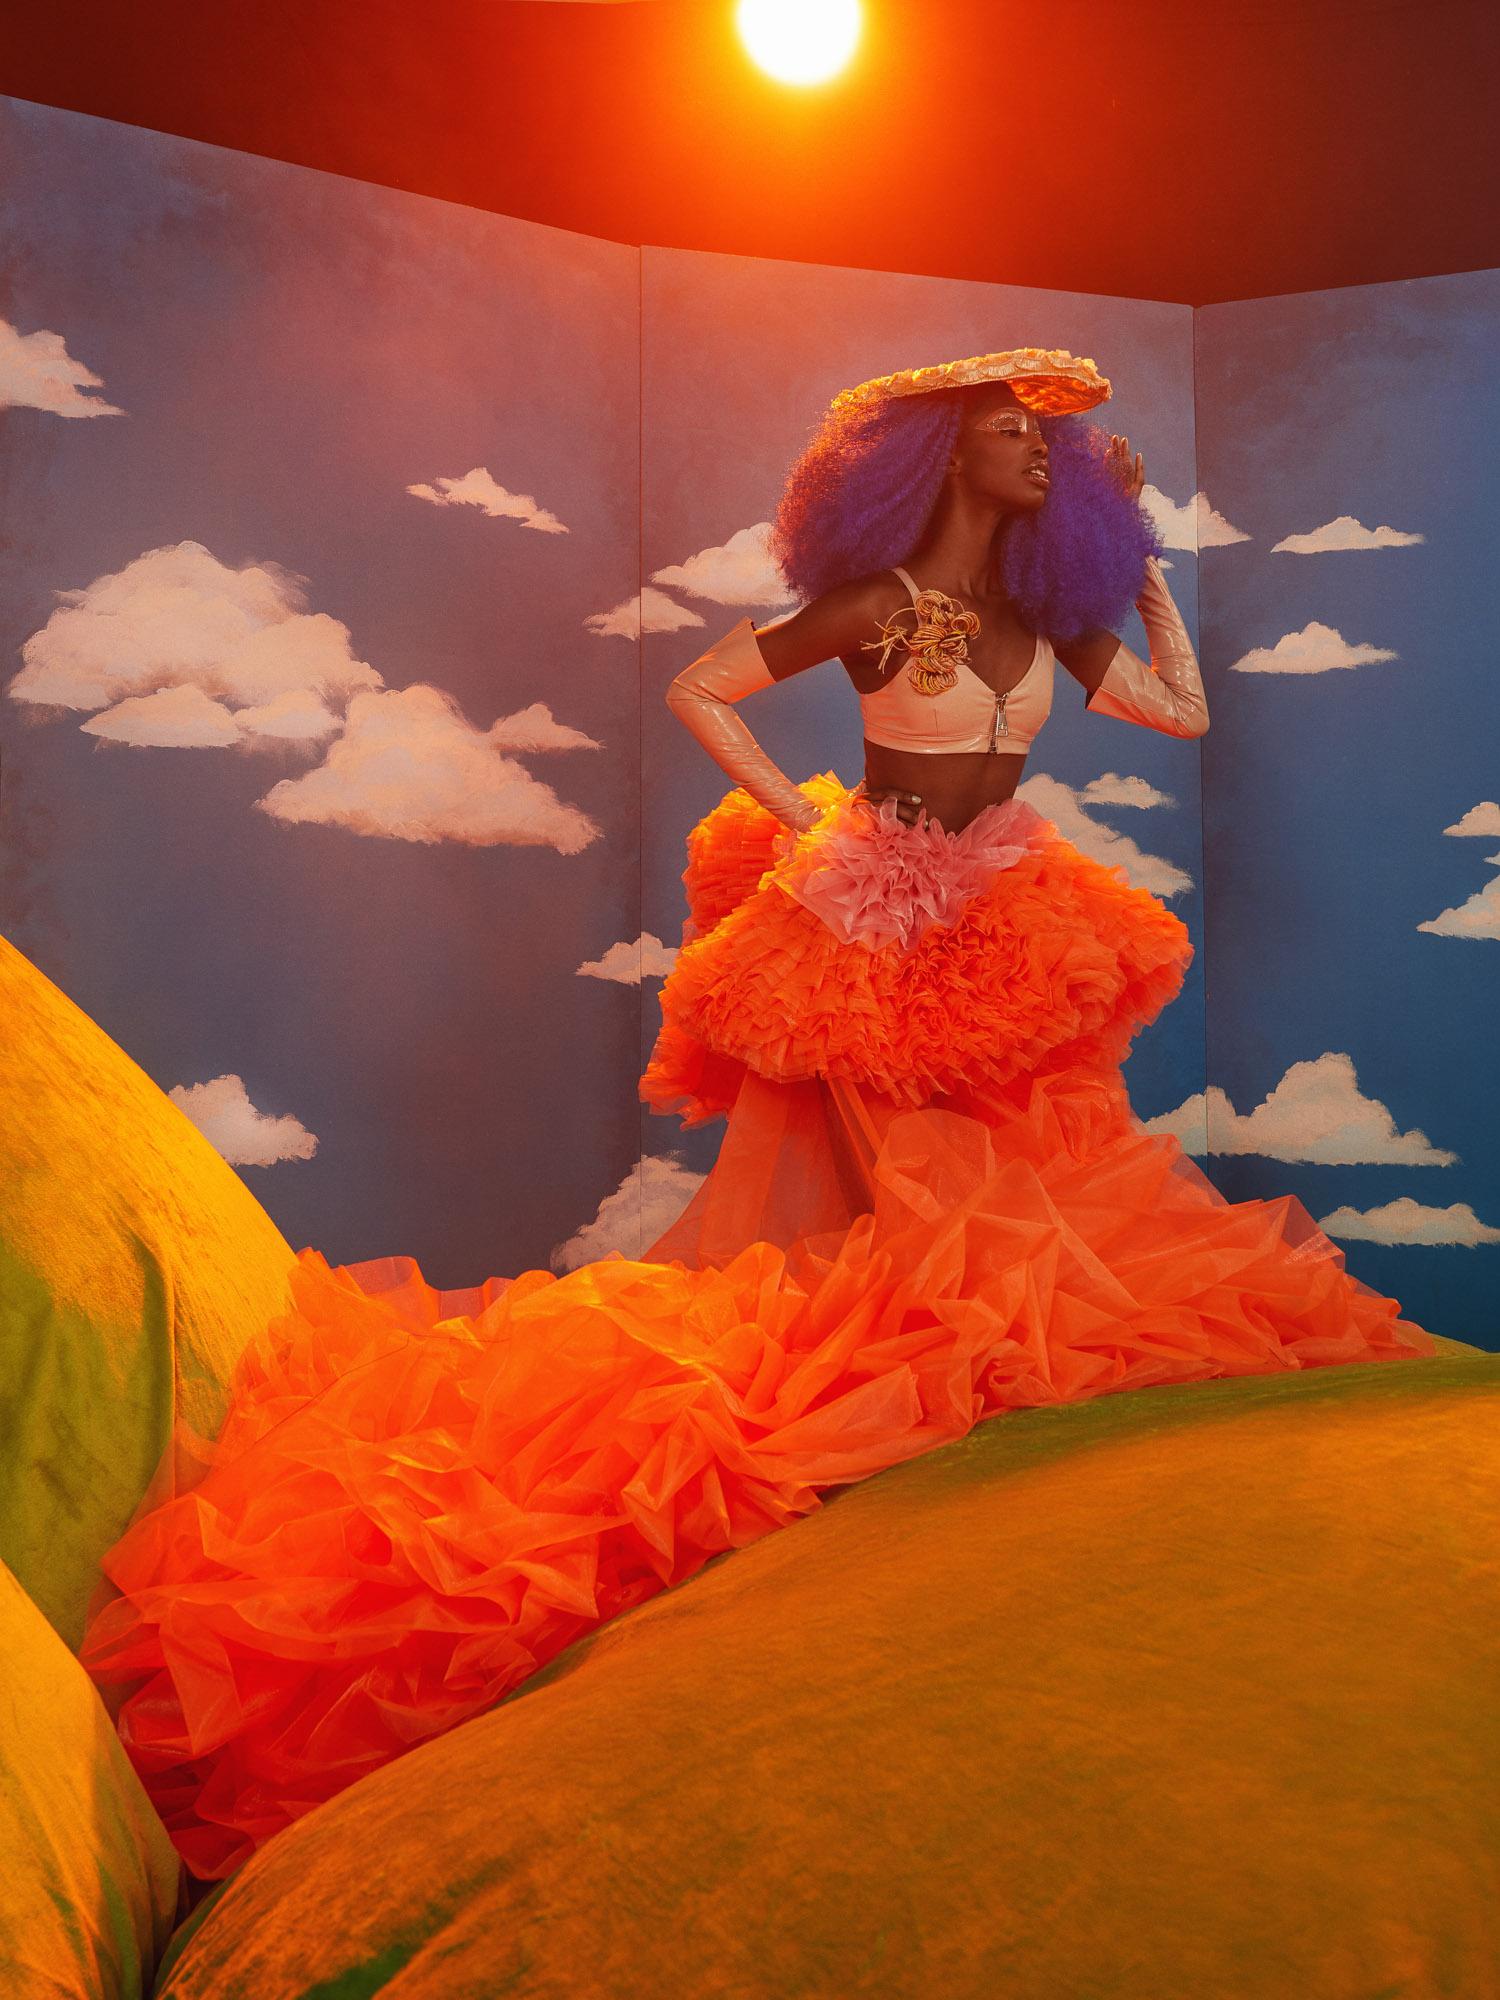 Fashion model wearing big orange tule dress on grass hill at sunset